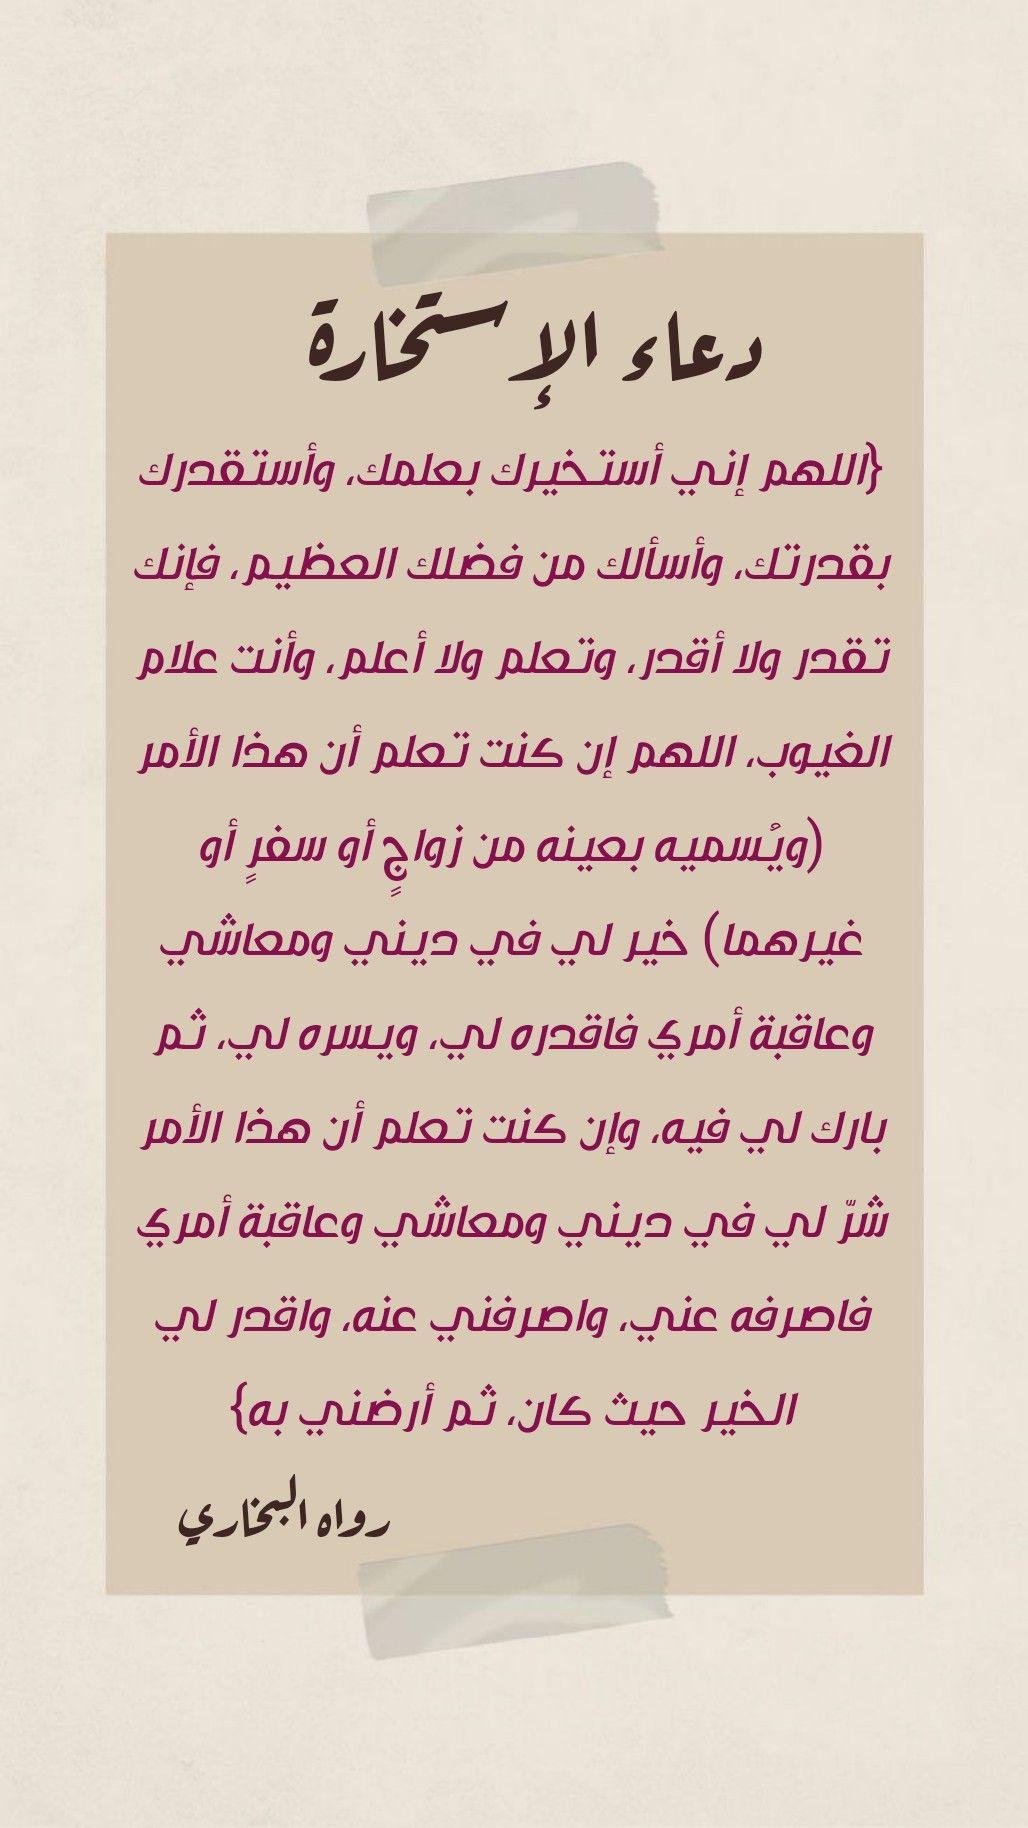 دعاء الاستخارة Arabic Calligraphy Islam Islamic Quotes